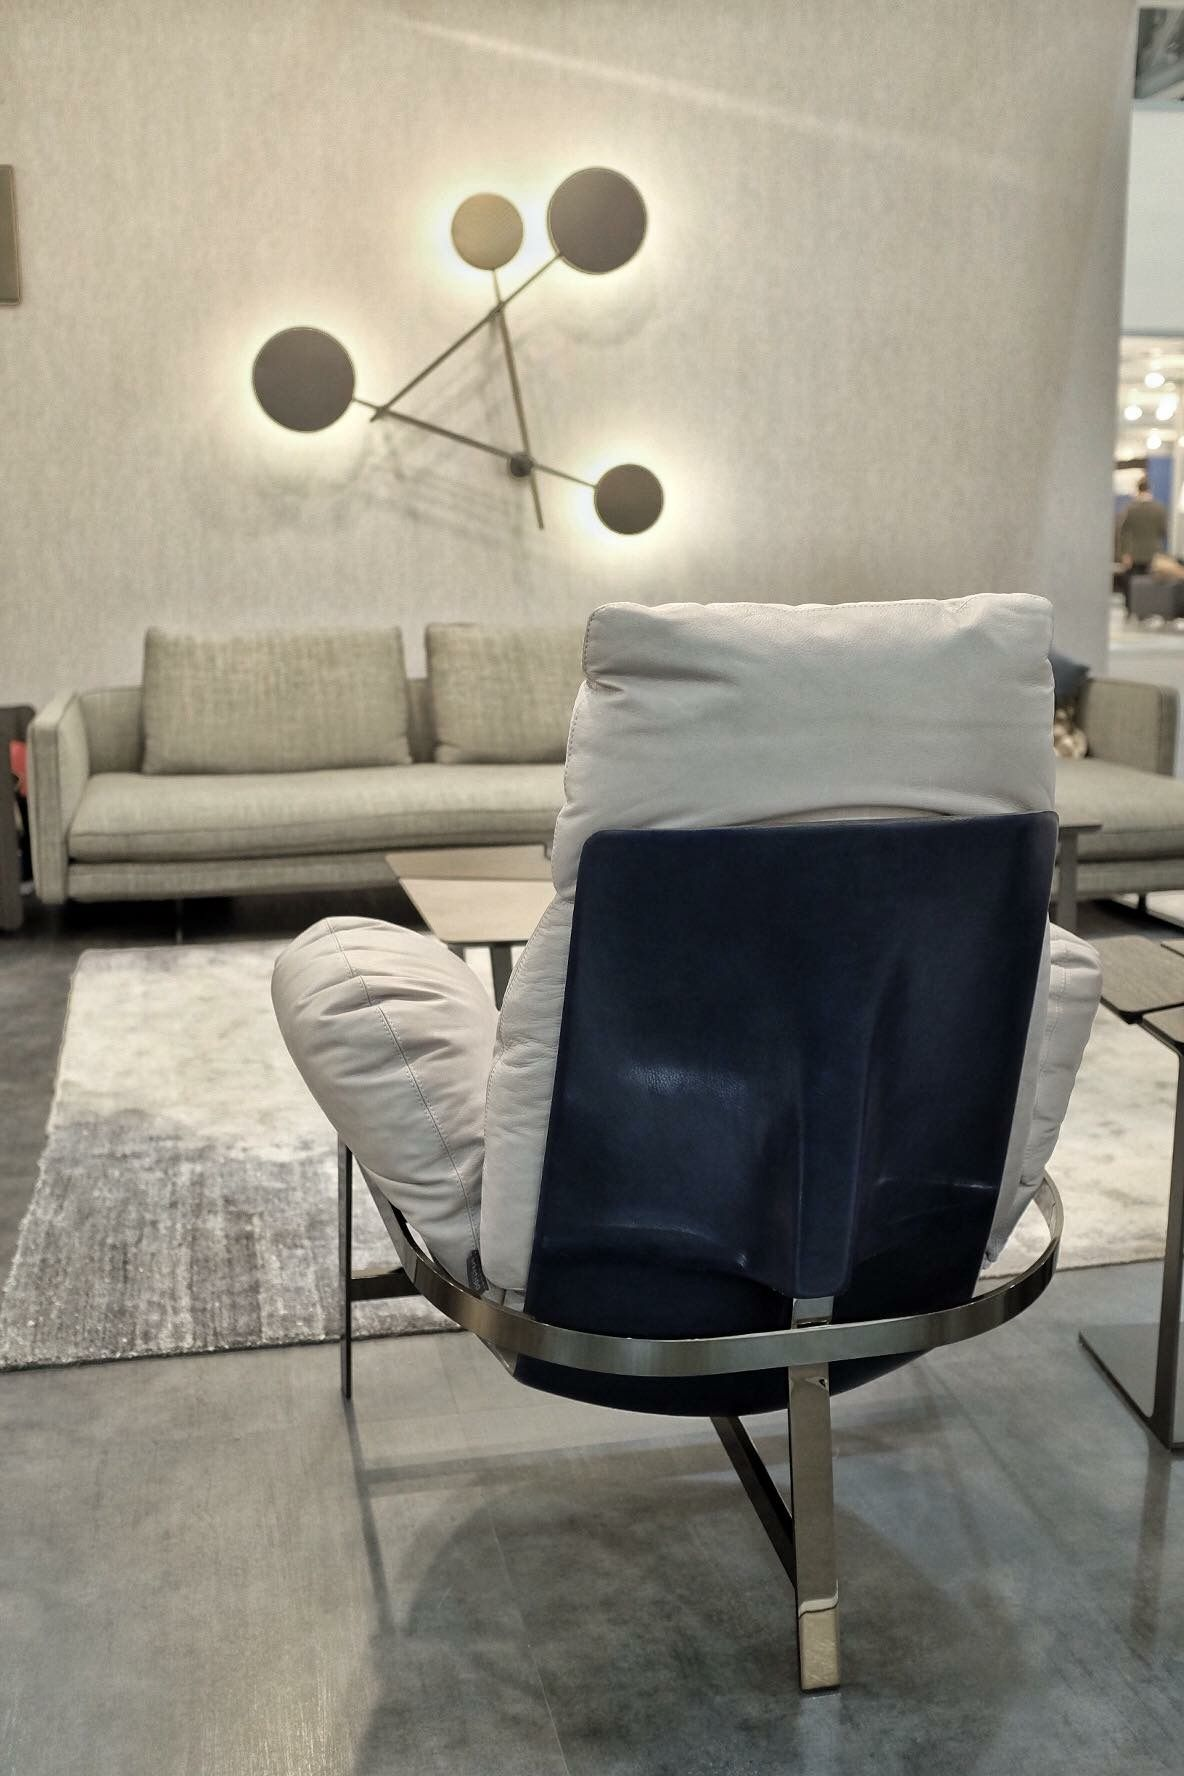 Luxe Design Fauteuil.Jupiter Design Fauteuil En Luxe